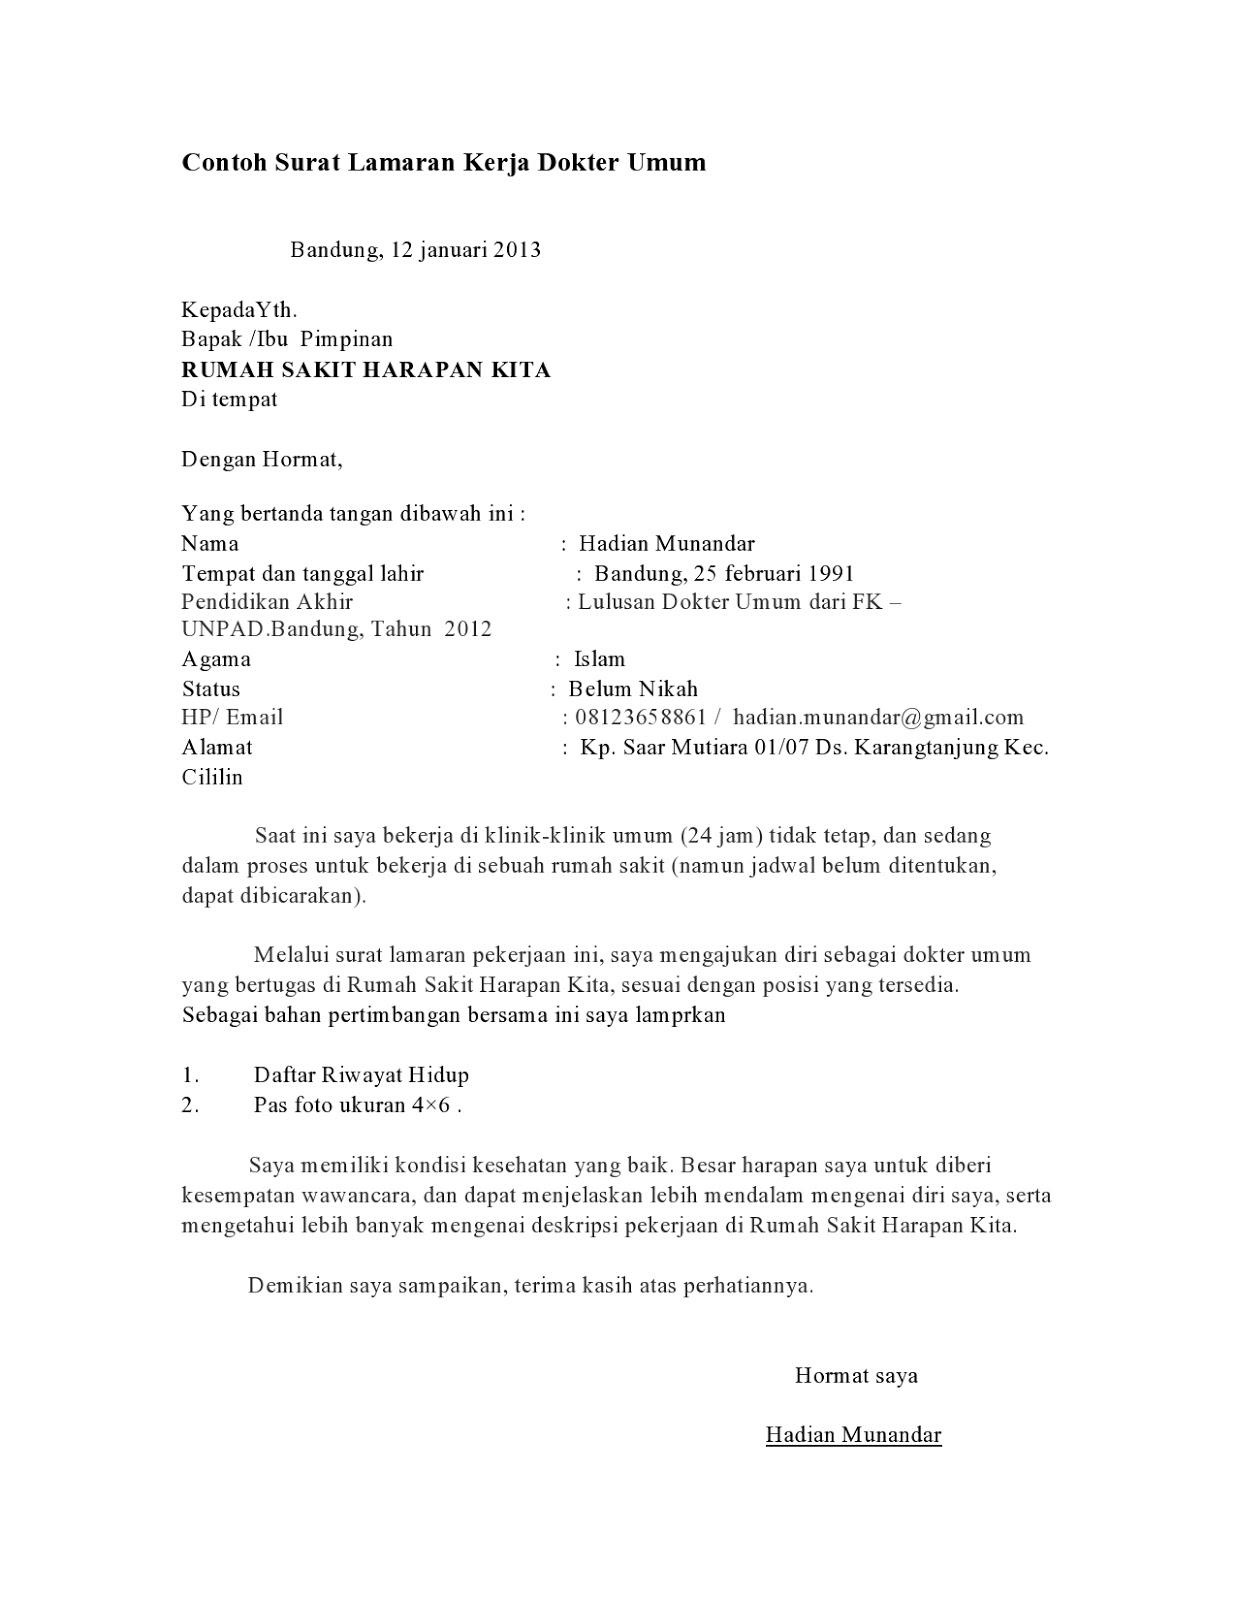 76 Contoh Surat Lamaran Kerja Untuk Rumah Sakit Hermina